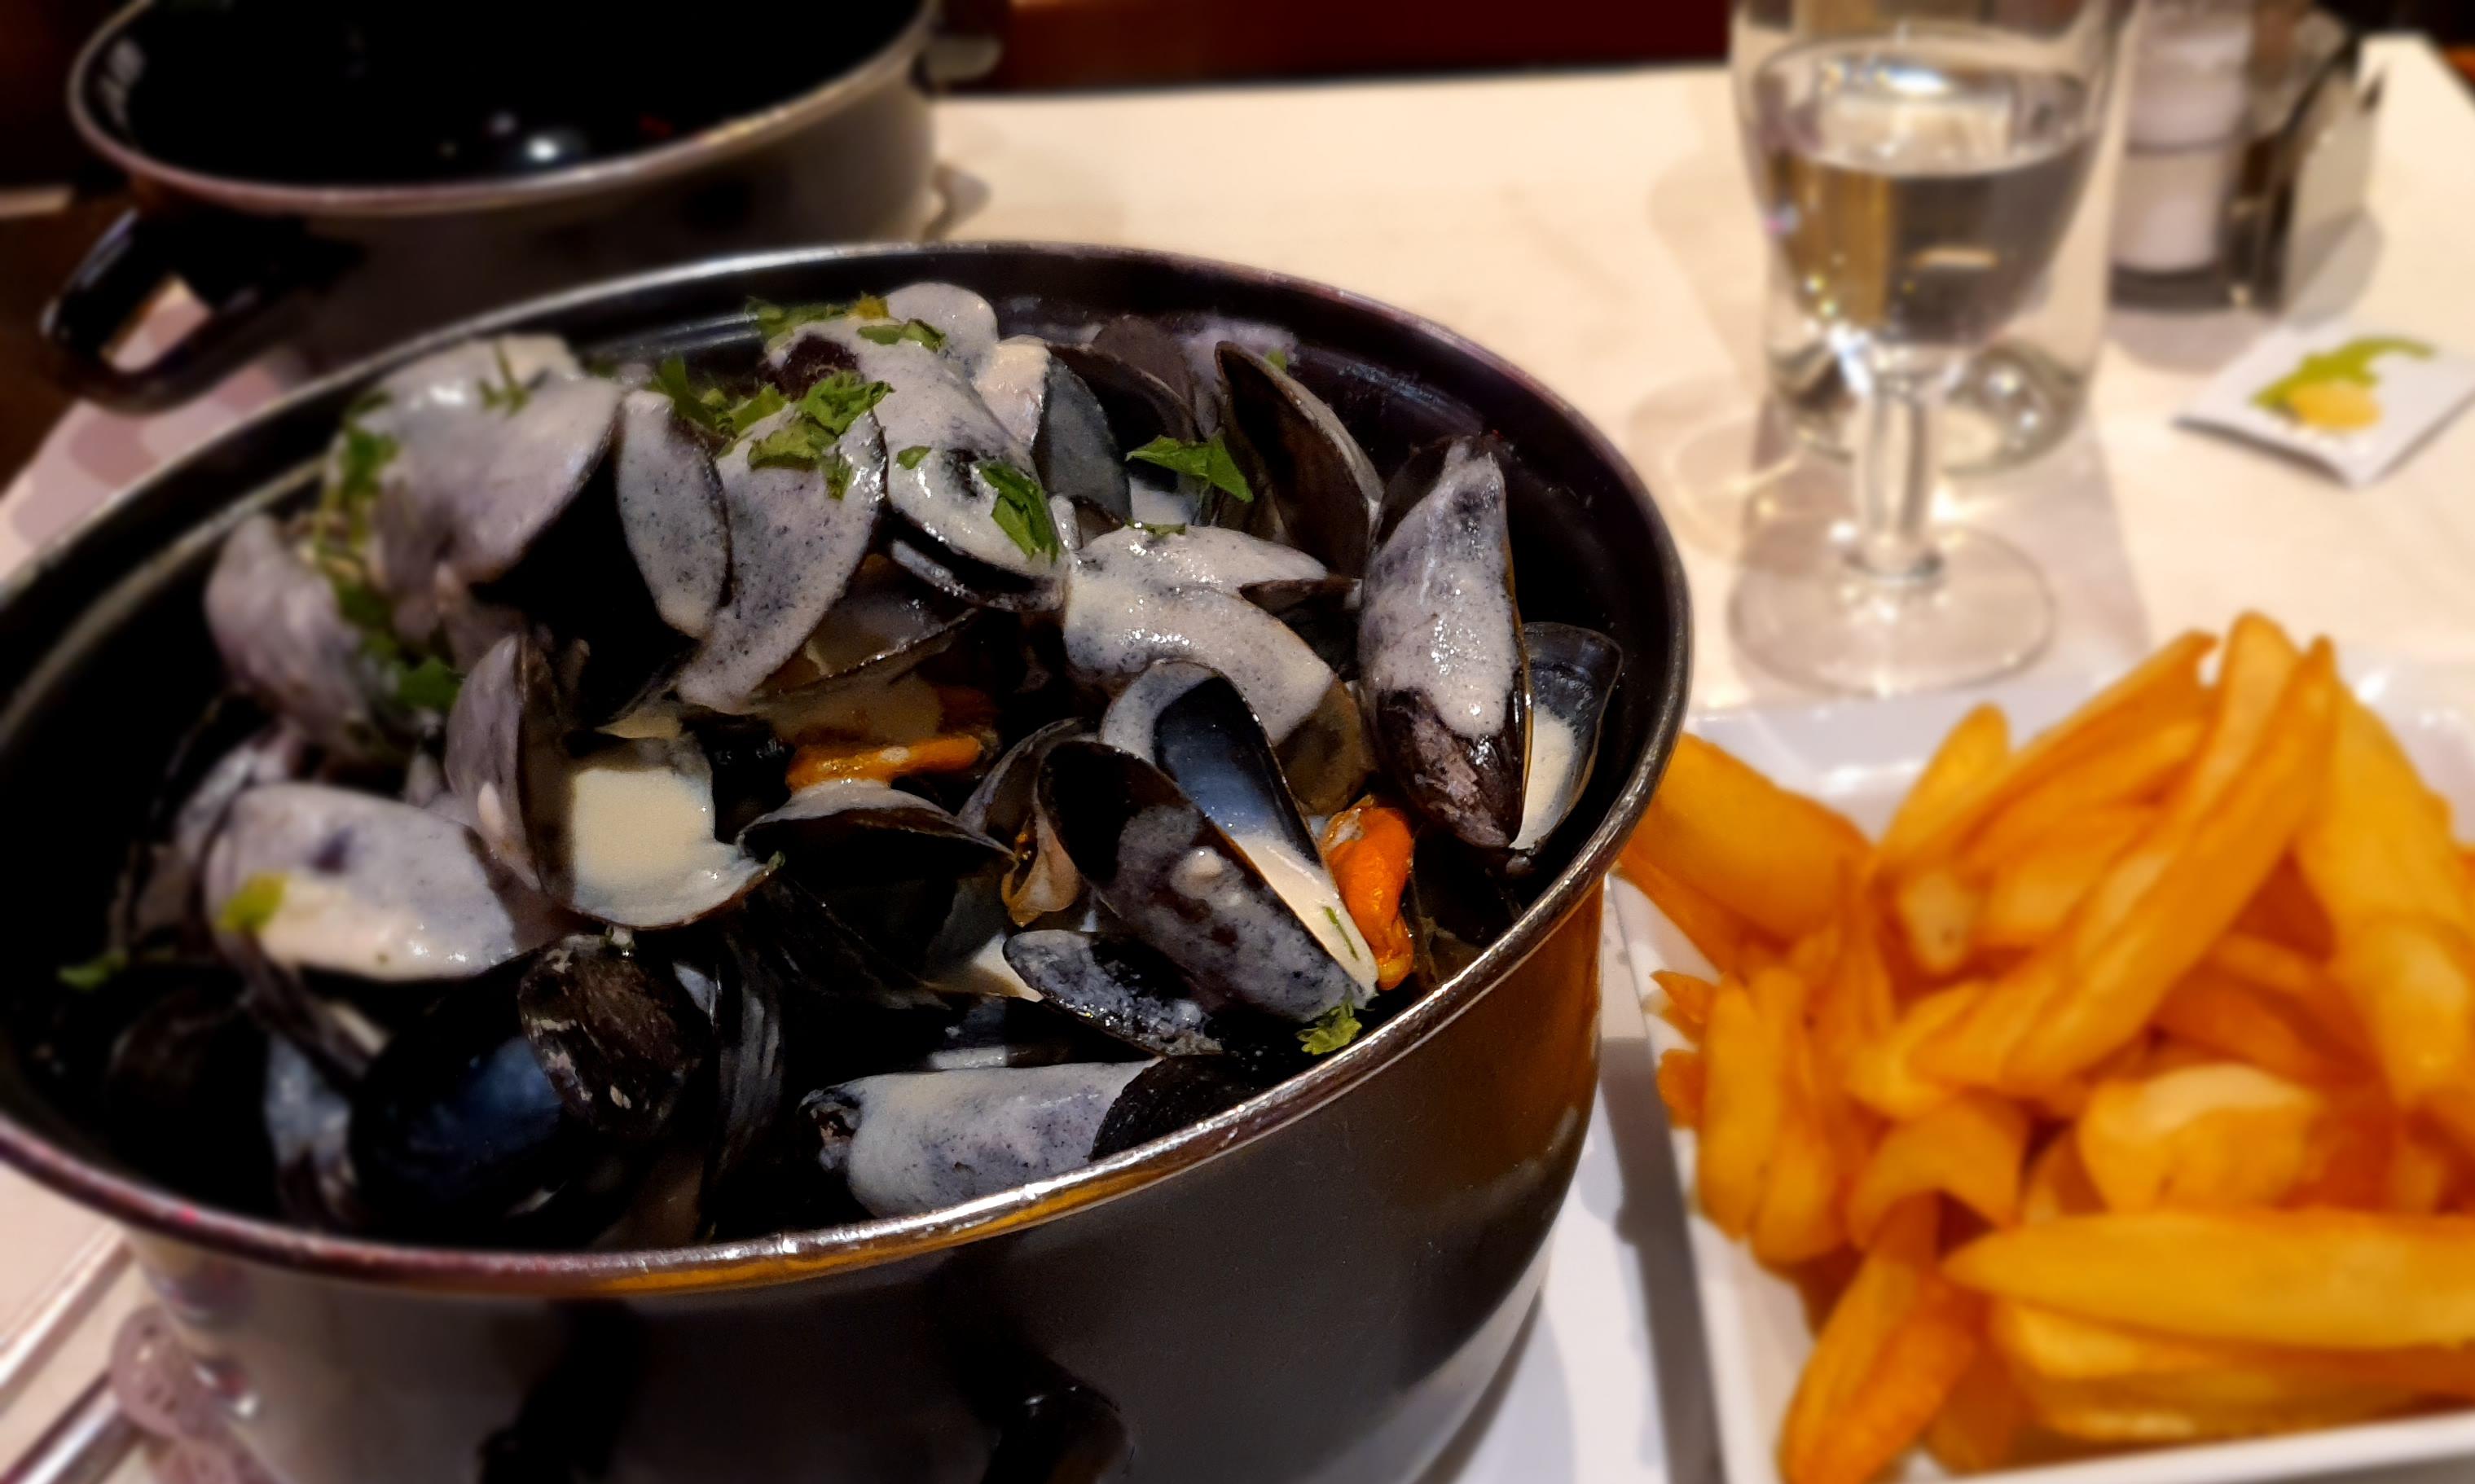 """Moules et Frites"" in a Parisian Brasserie"